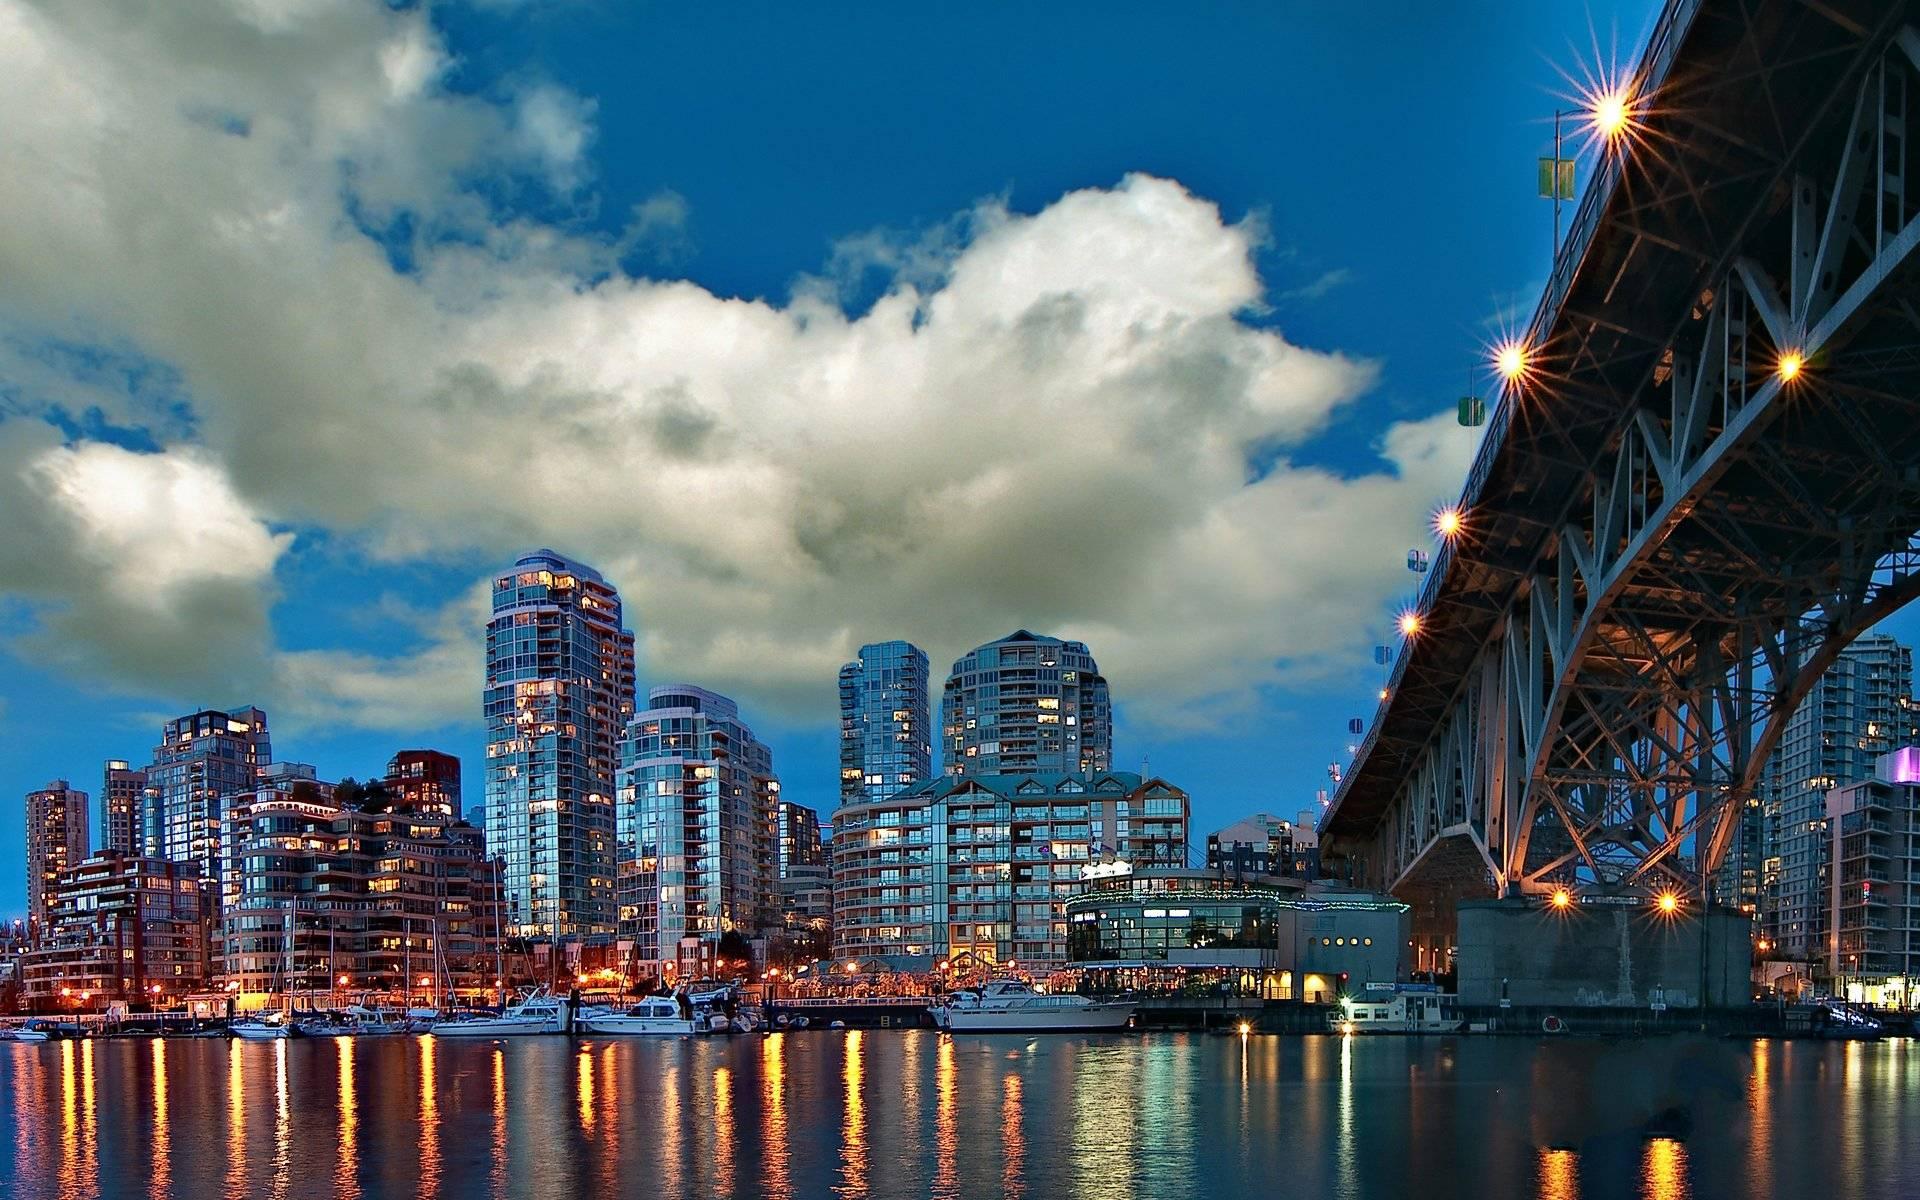 город река страны архитектура огни облака загрузить